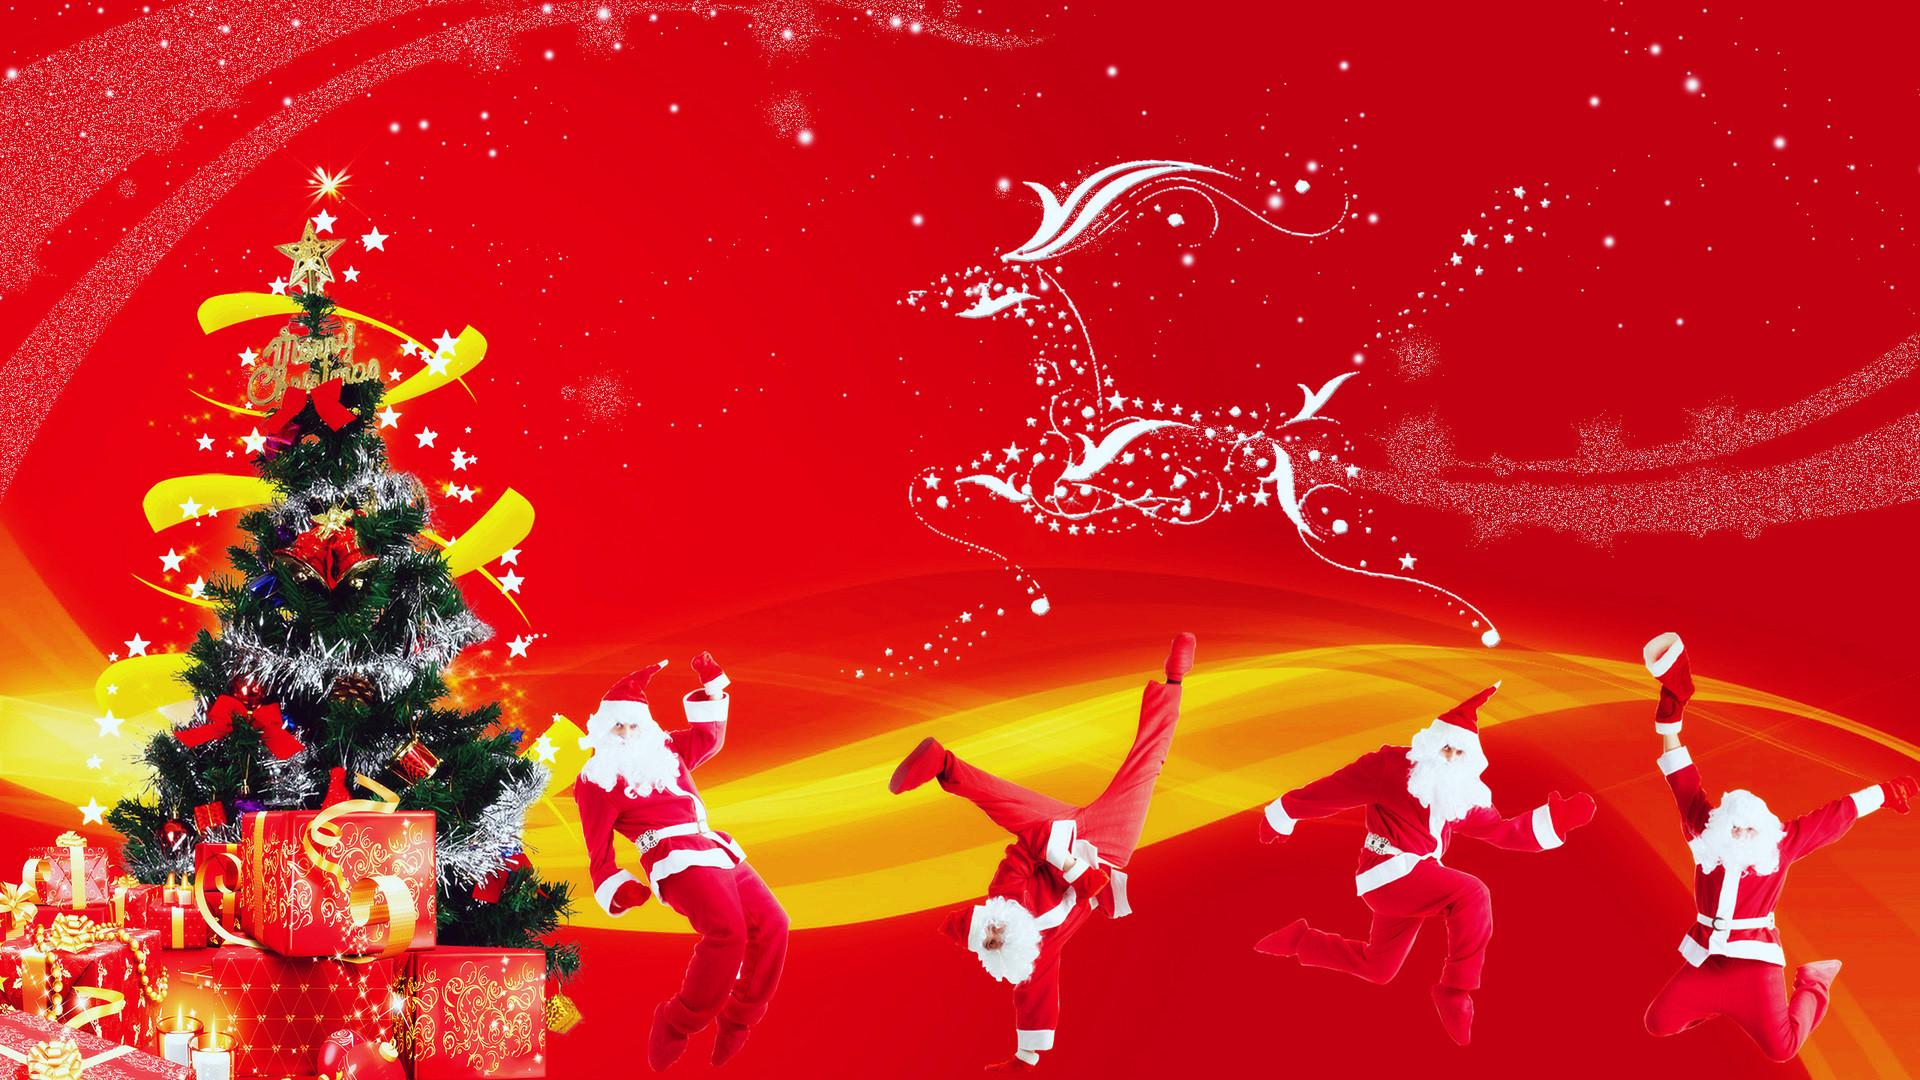 Res: 1920x1080, Download Funny Christmas Wallpaper Funny Christmas Santa Claus